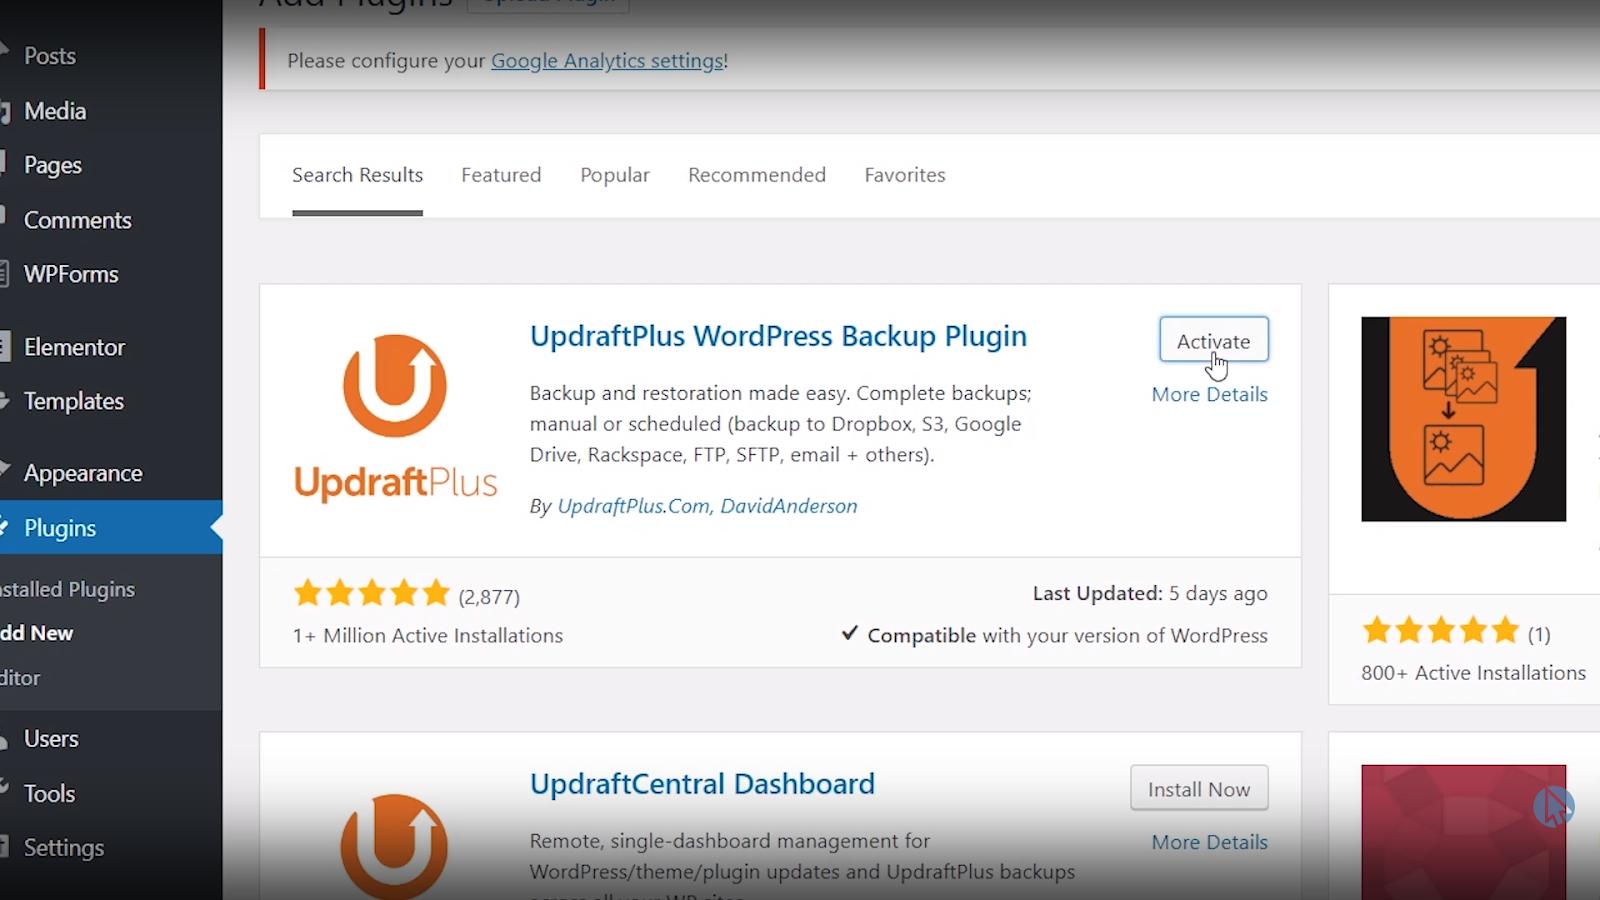 updraft plus wordpress backup plugin activate